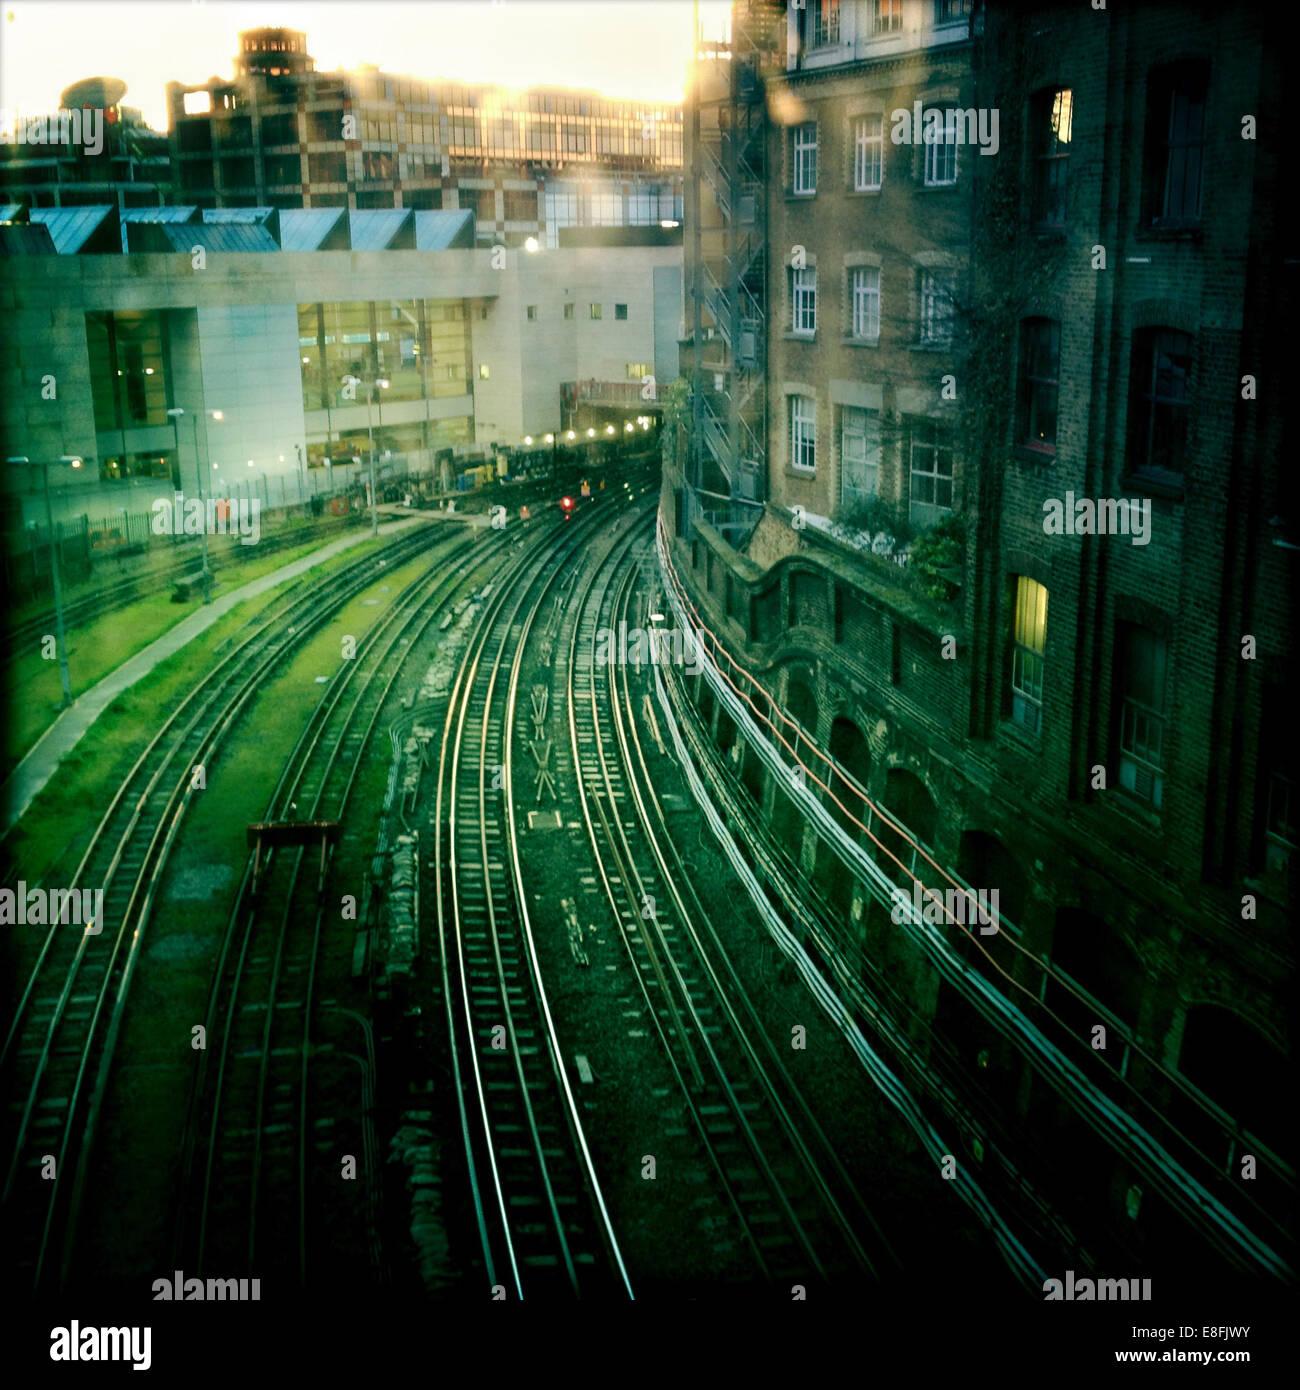 UK, London, Clerkenwell, Cowcross Street, Farringdon, Railway lines - Stock Image